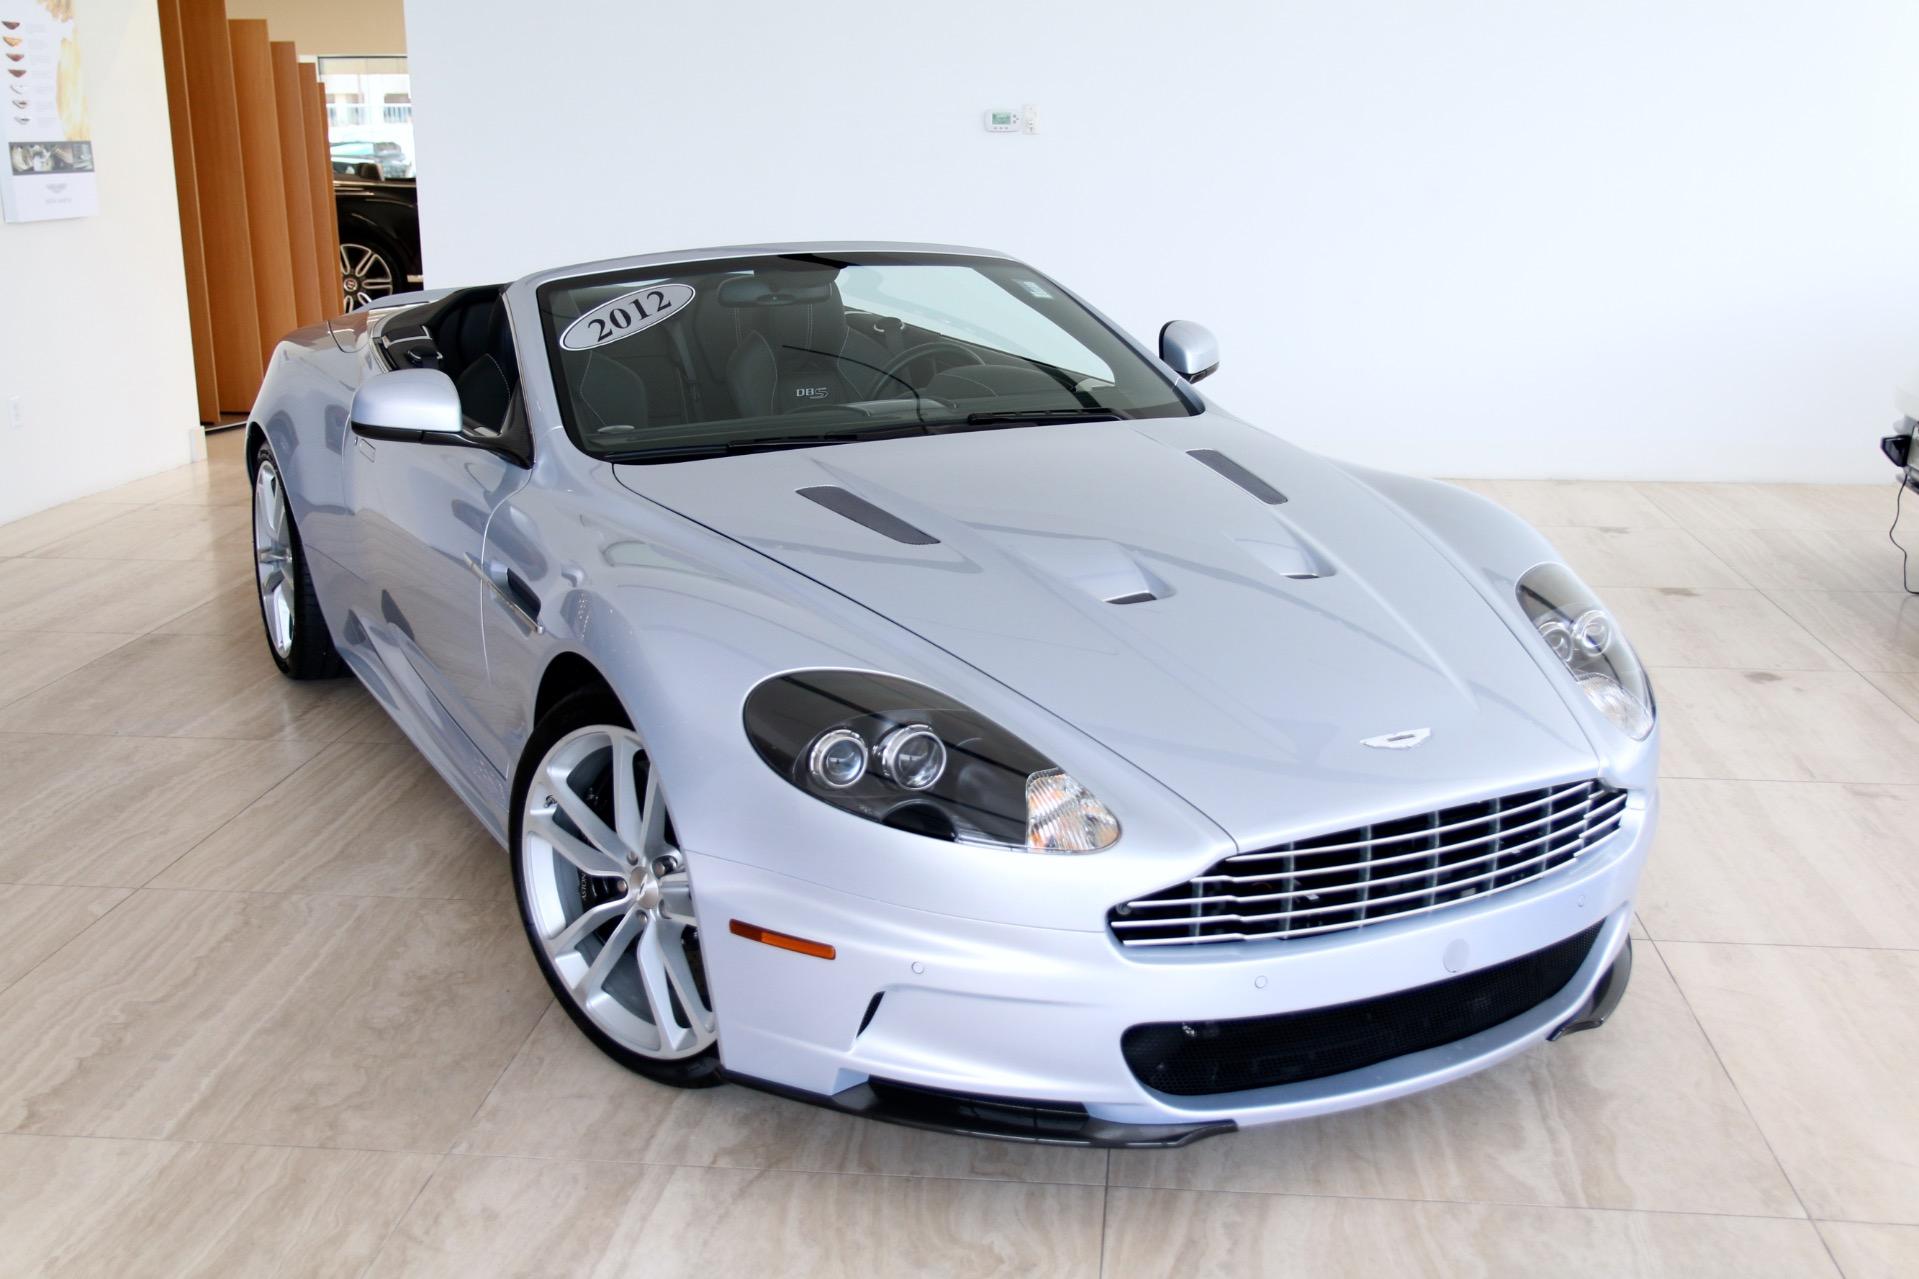 2020 Aston Martin DBS Superleggera Volante - Details ...  |Aston Martin Dbs Volante